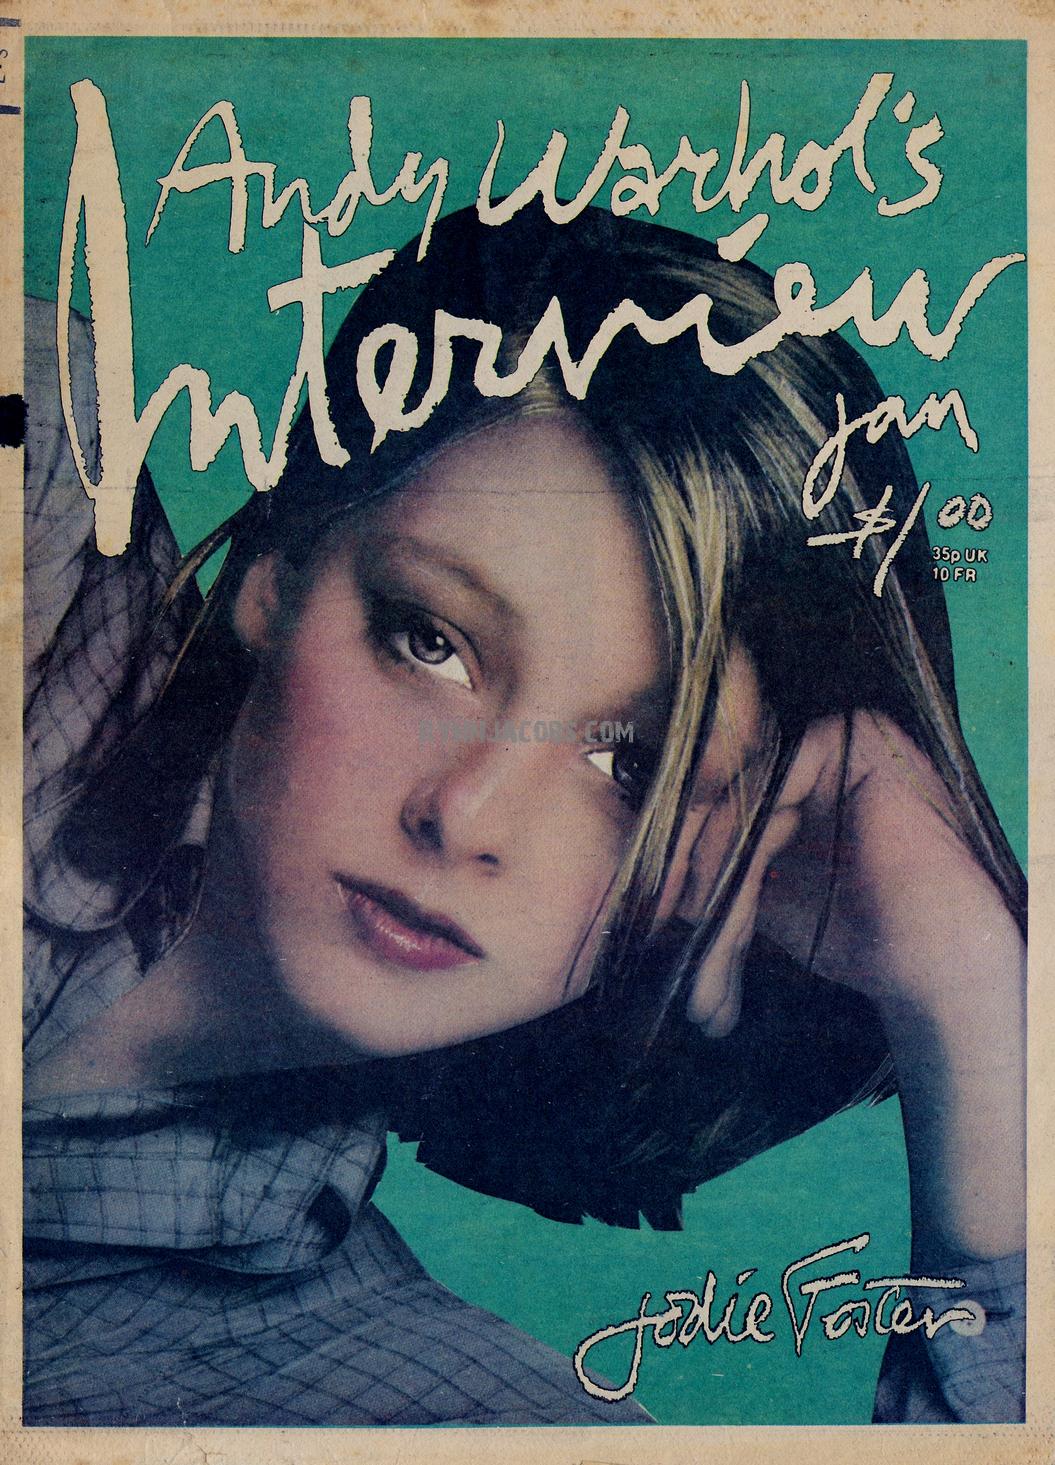 http://2.bp.blogspot.com/-_5js44LLrtA/Tb4XAA4ciqI/AAAAAAAAAgo/JFKex03kTKg/s1600/Andy+Warhol%2527s+Interview+magazine+1977+%25281%2529_tn.jpg